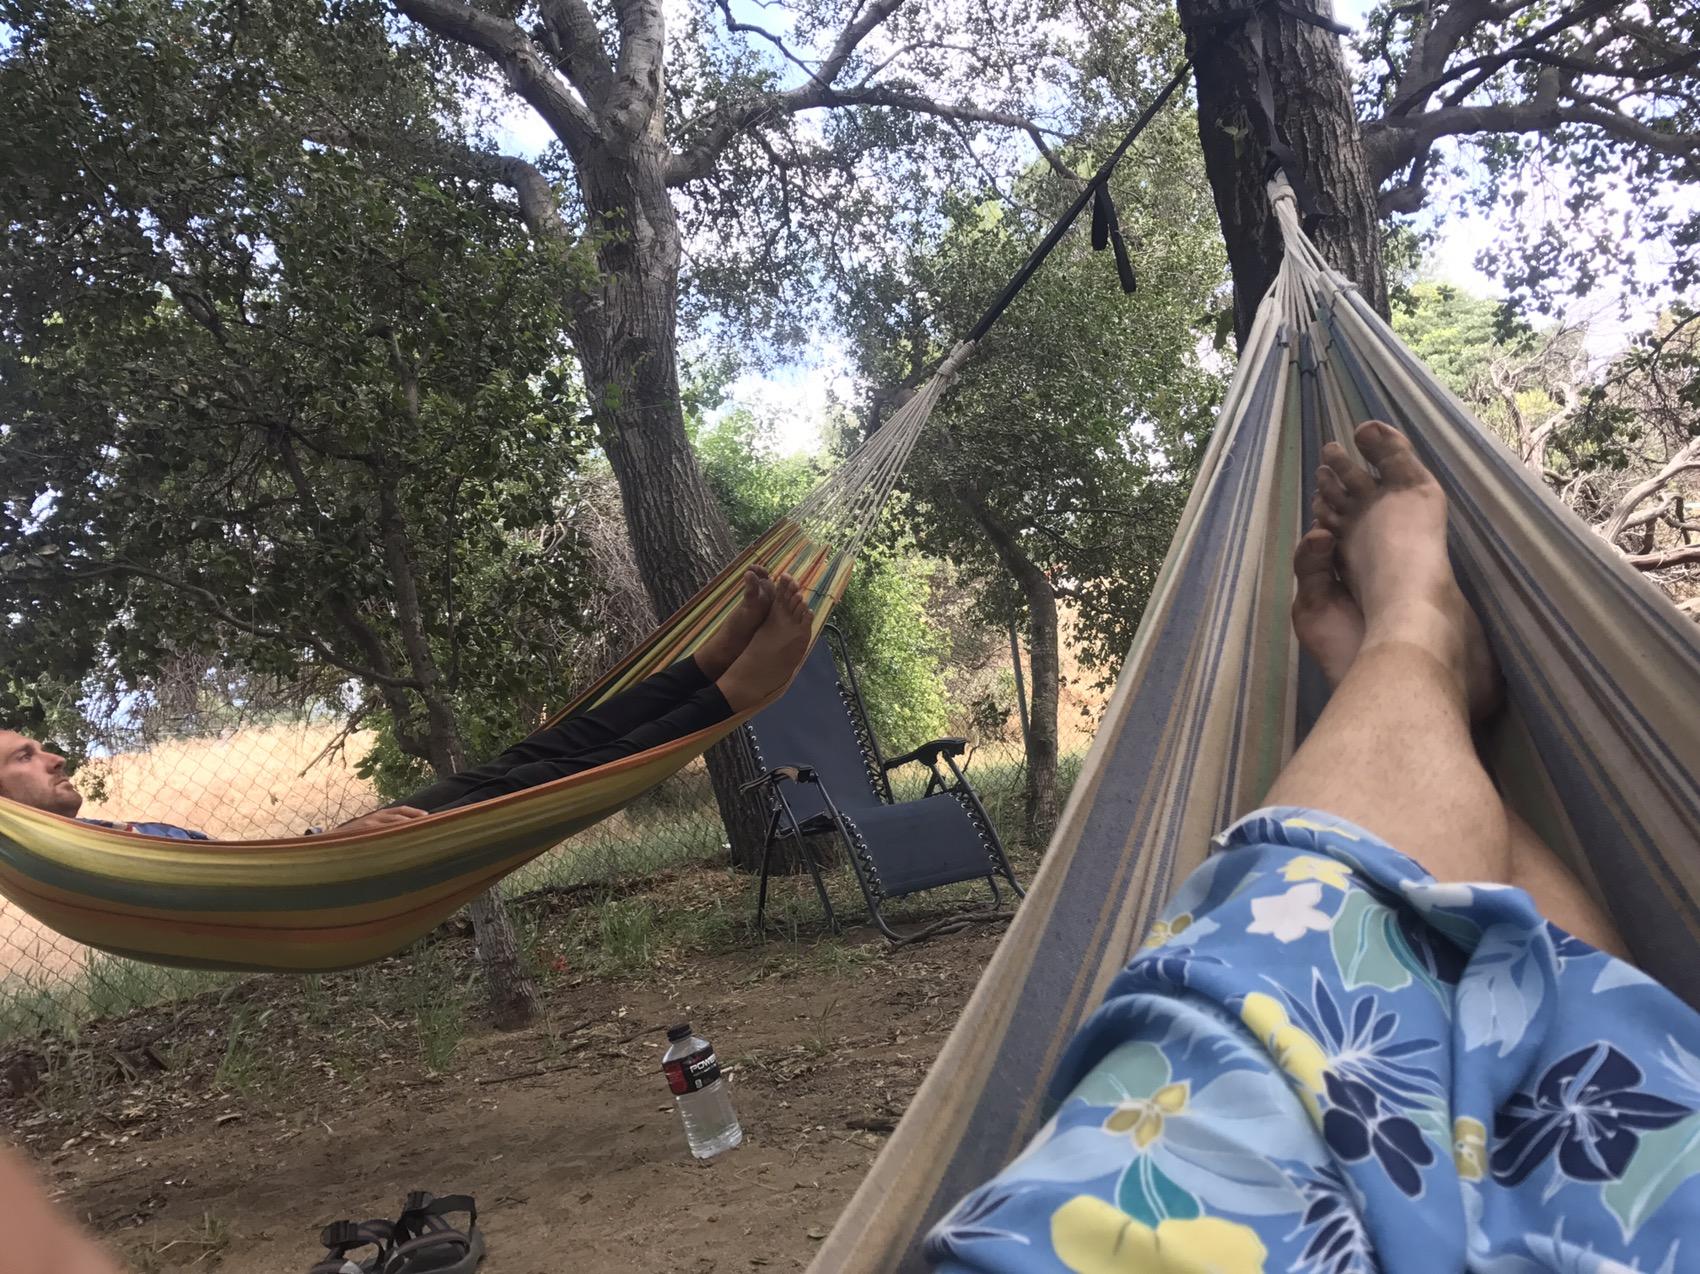 Casa Hippies : Hippie daycare u day hilltop to casa de luna u colleen stinchcombe